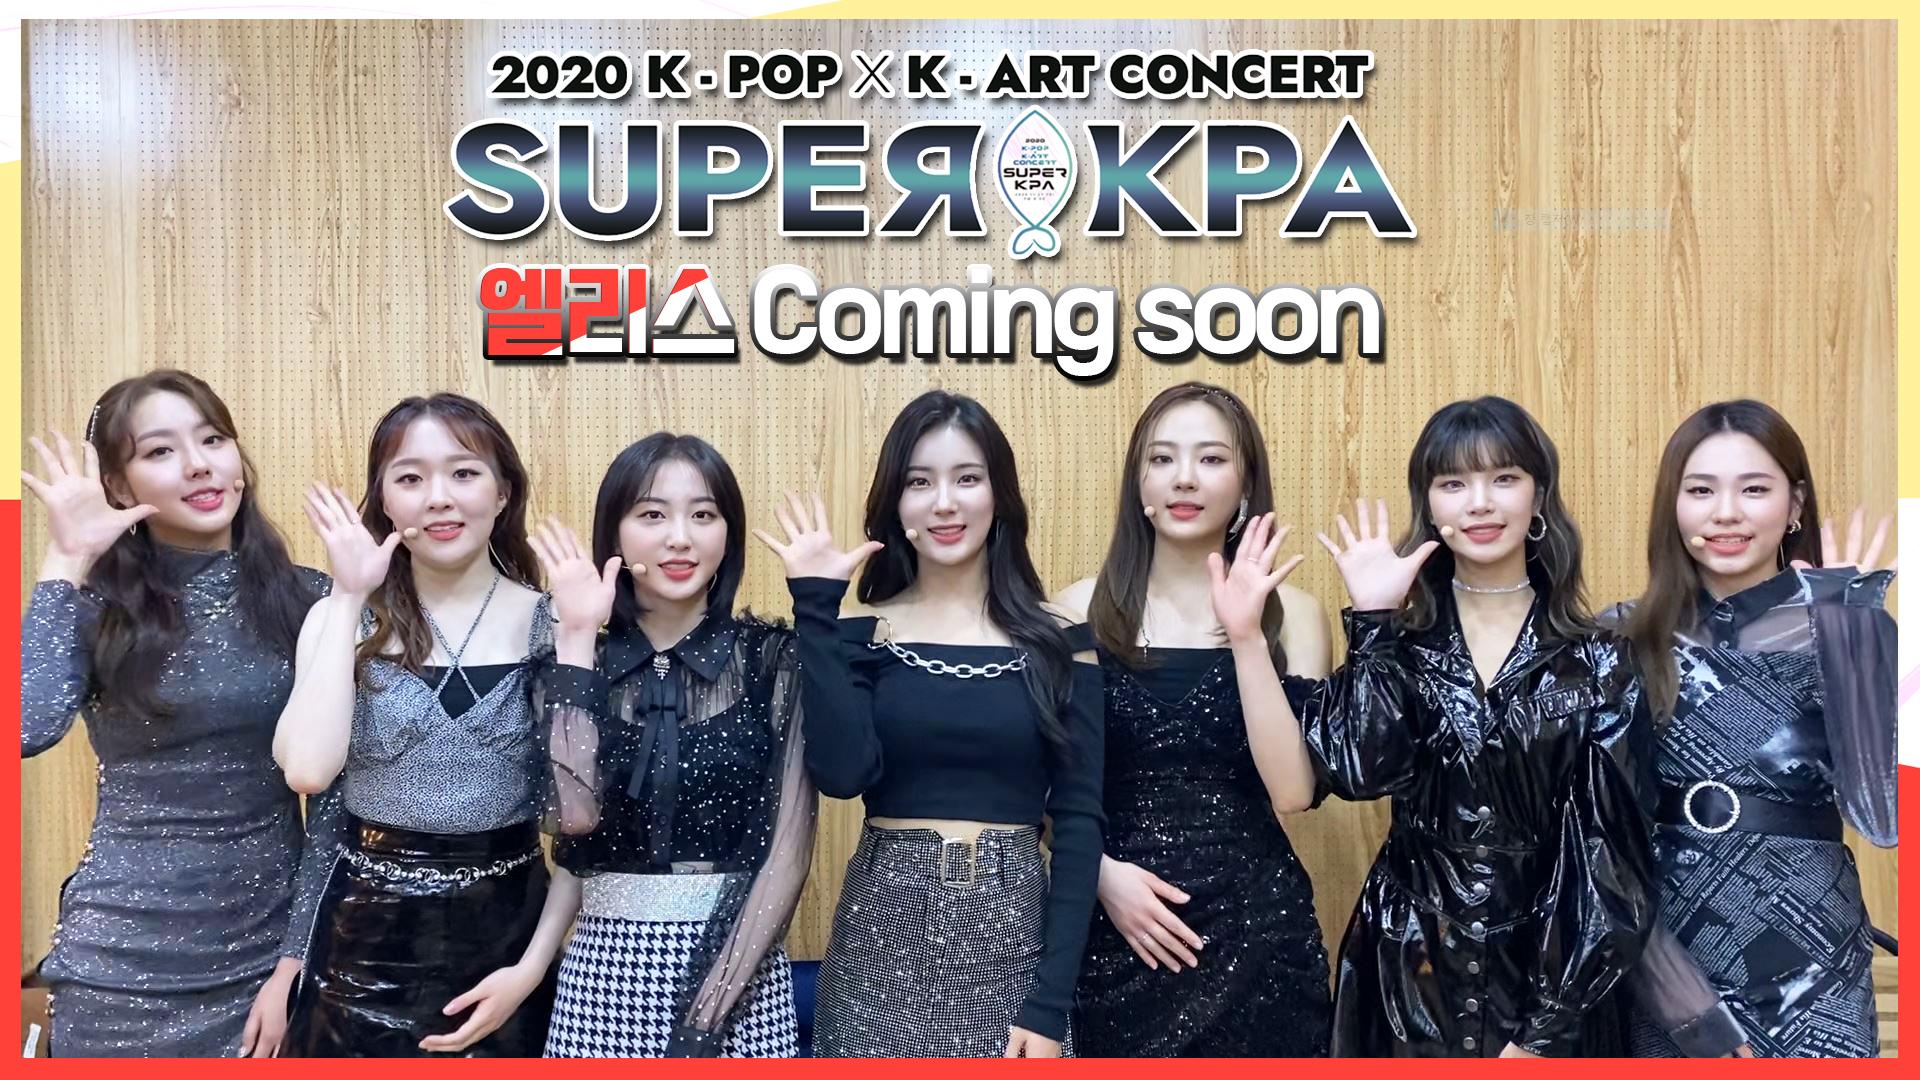 [Beyond LIVE - 2020 K-POP x K-ART CONCERT SUPER KPA] - ELRIS